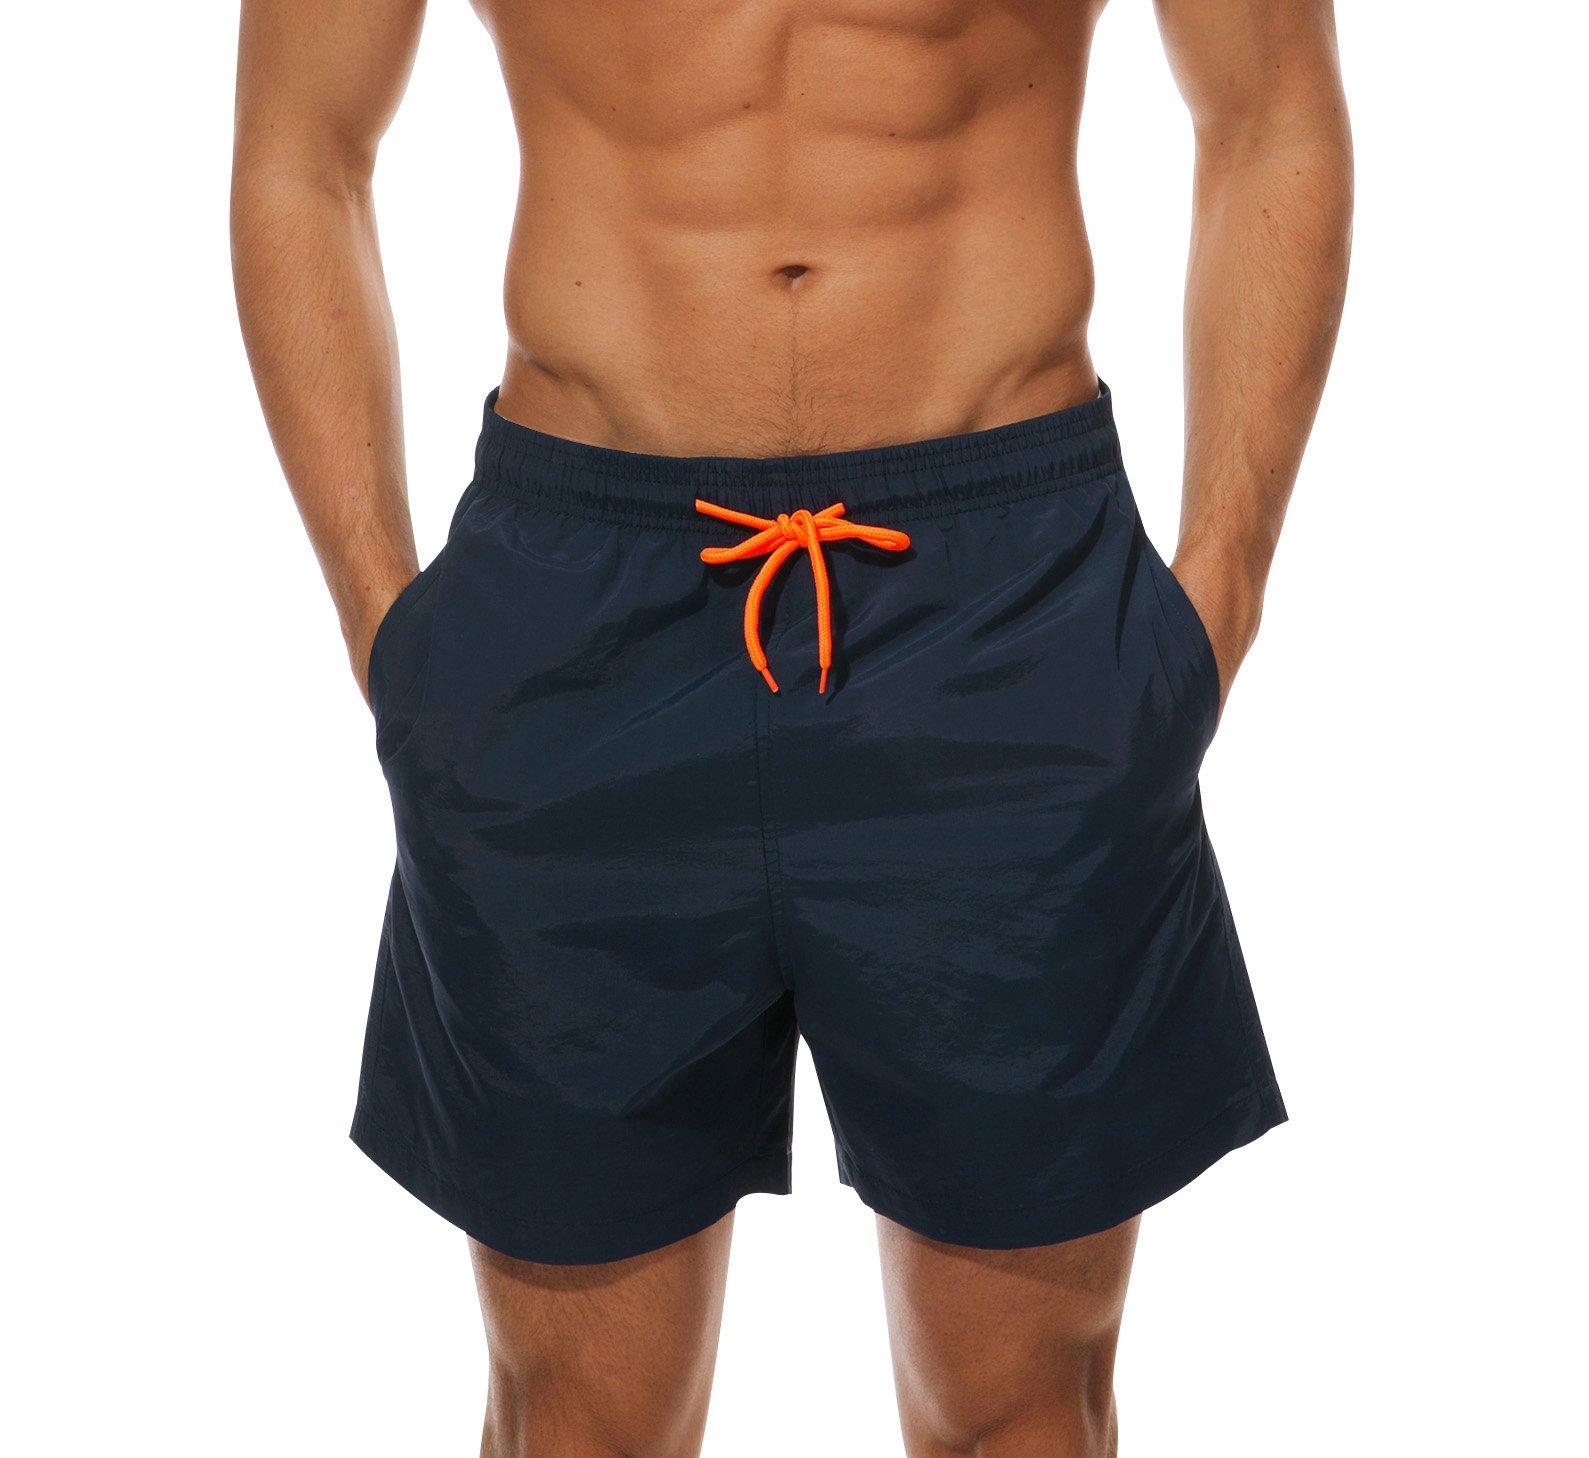 Ehpow Men's Beach Shorts Quick Dry Waterproof Sports Shorts Bathing Suit Swim Trunks, Navy, Large